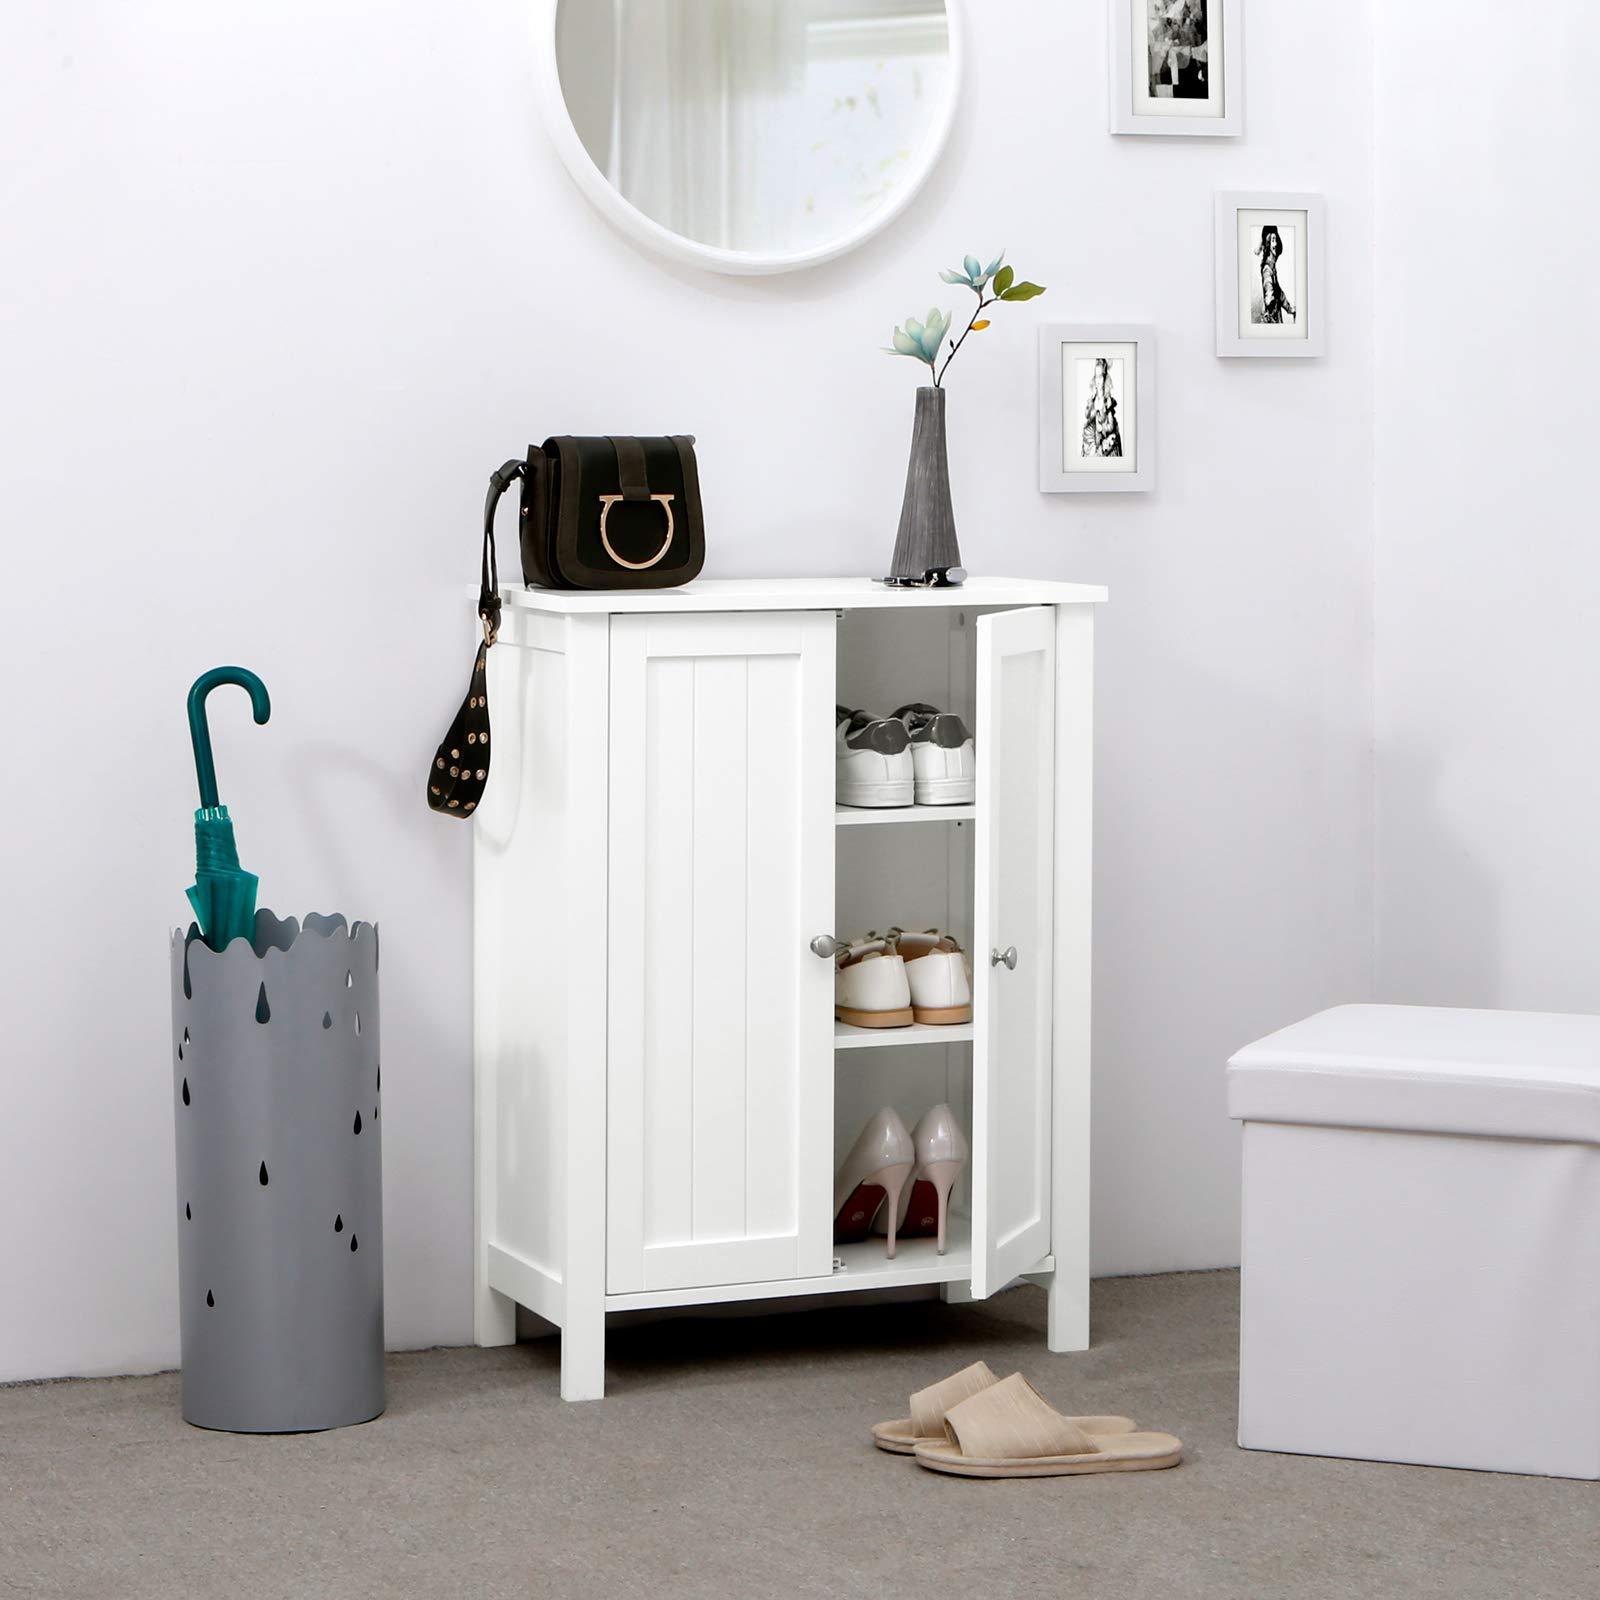 Super Vasagle Bathroom Floor Storage Cabinet With Double Door Adjustable Shelf 23 6 X 11 8 X 31 5 Inches White Ubcb60W Interior Design Ideas Skatsoteloinfo